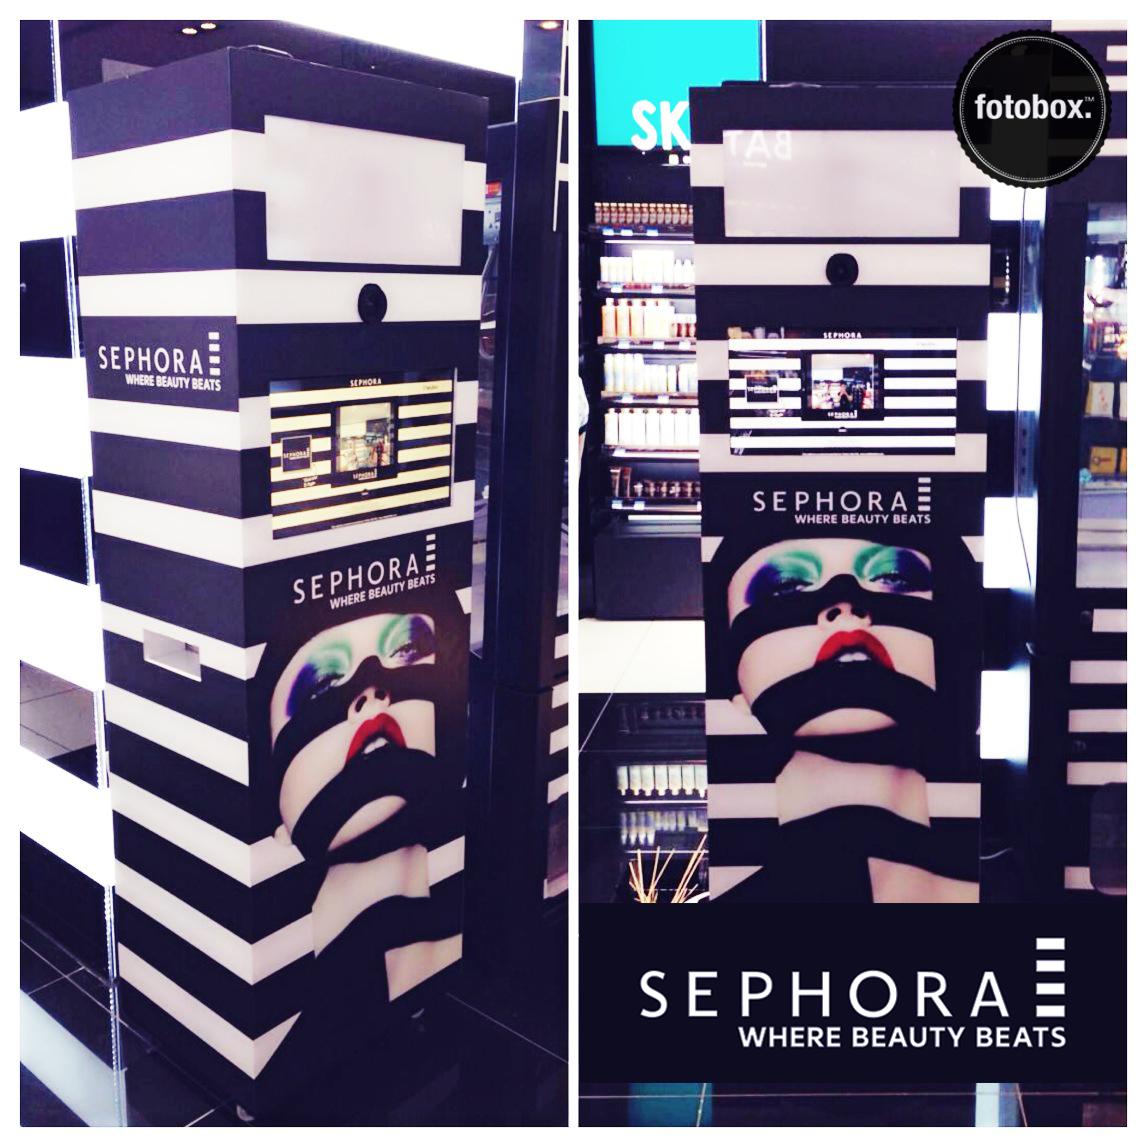 Sephora Fotobox.jpg